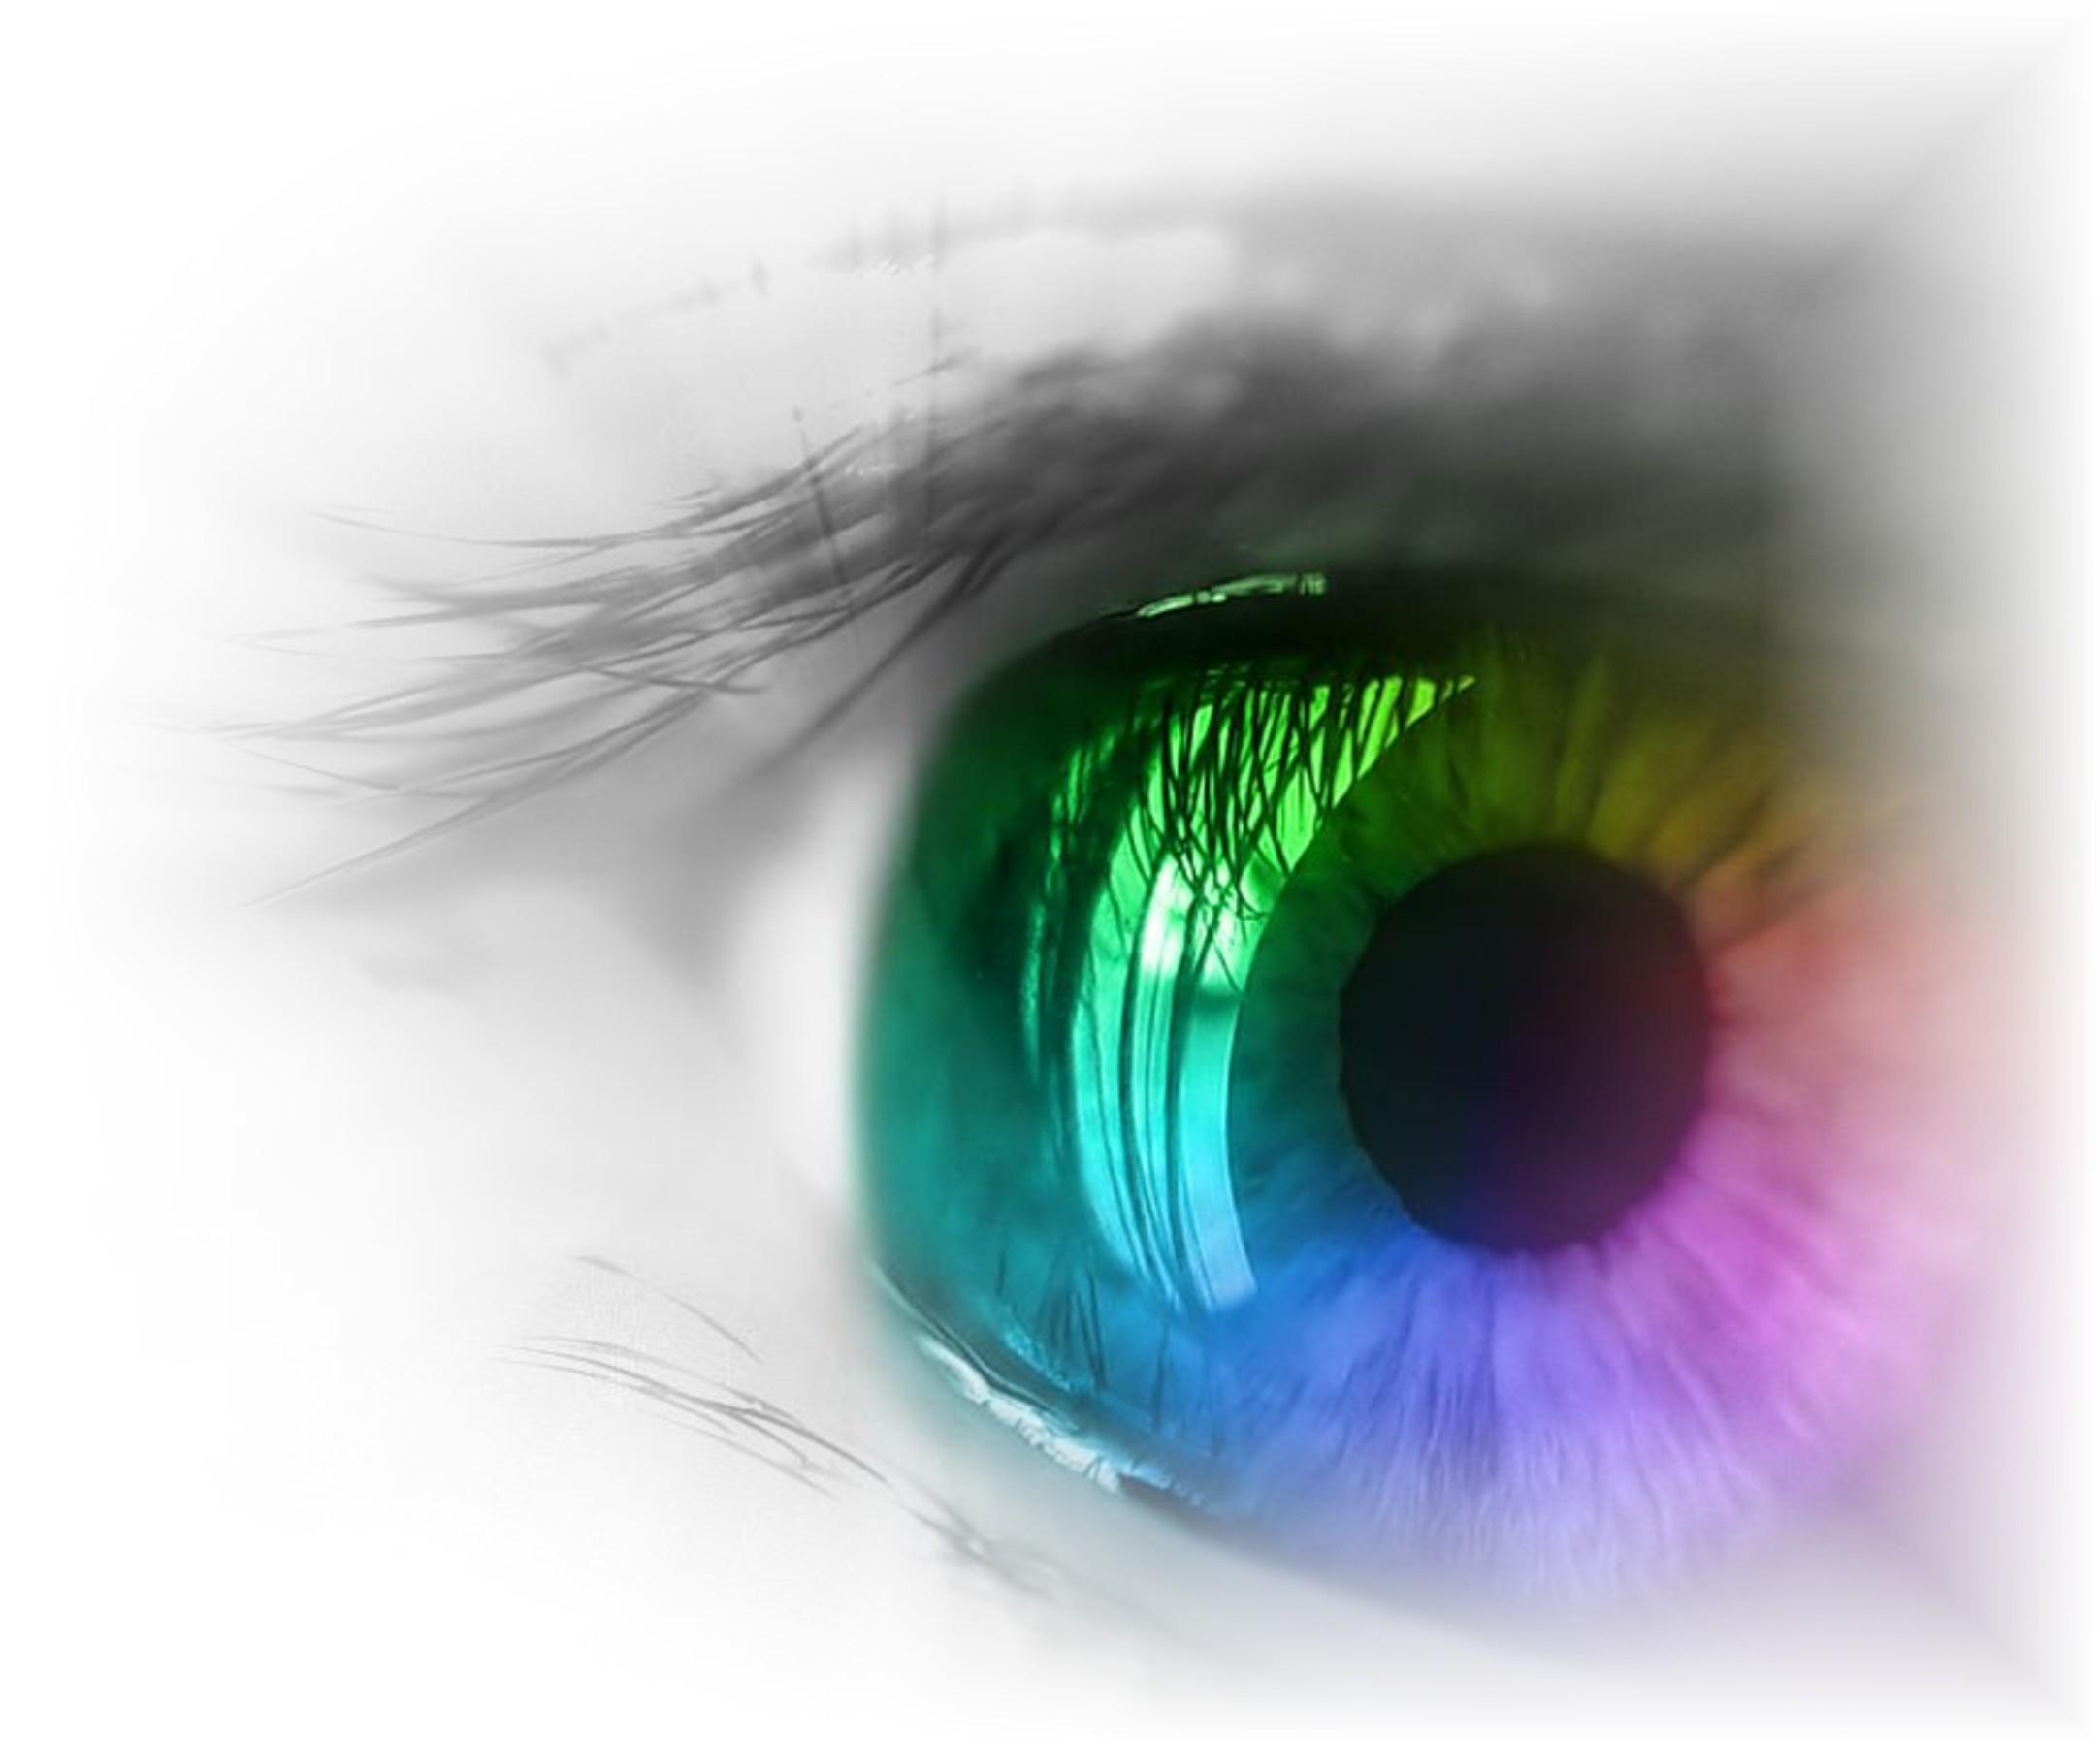 An eye for an eye makes the world blind essay writer